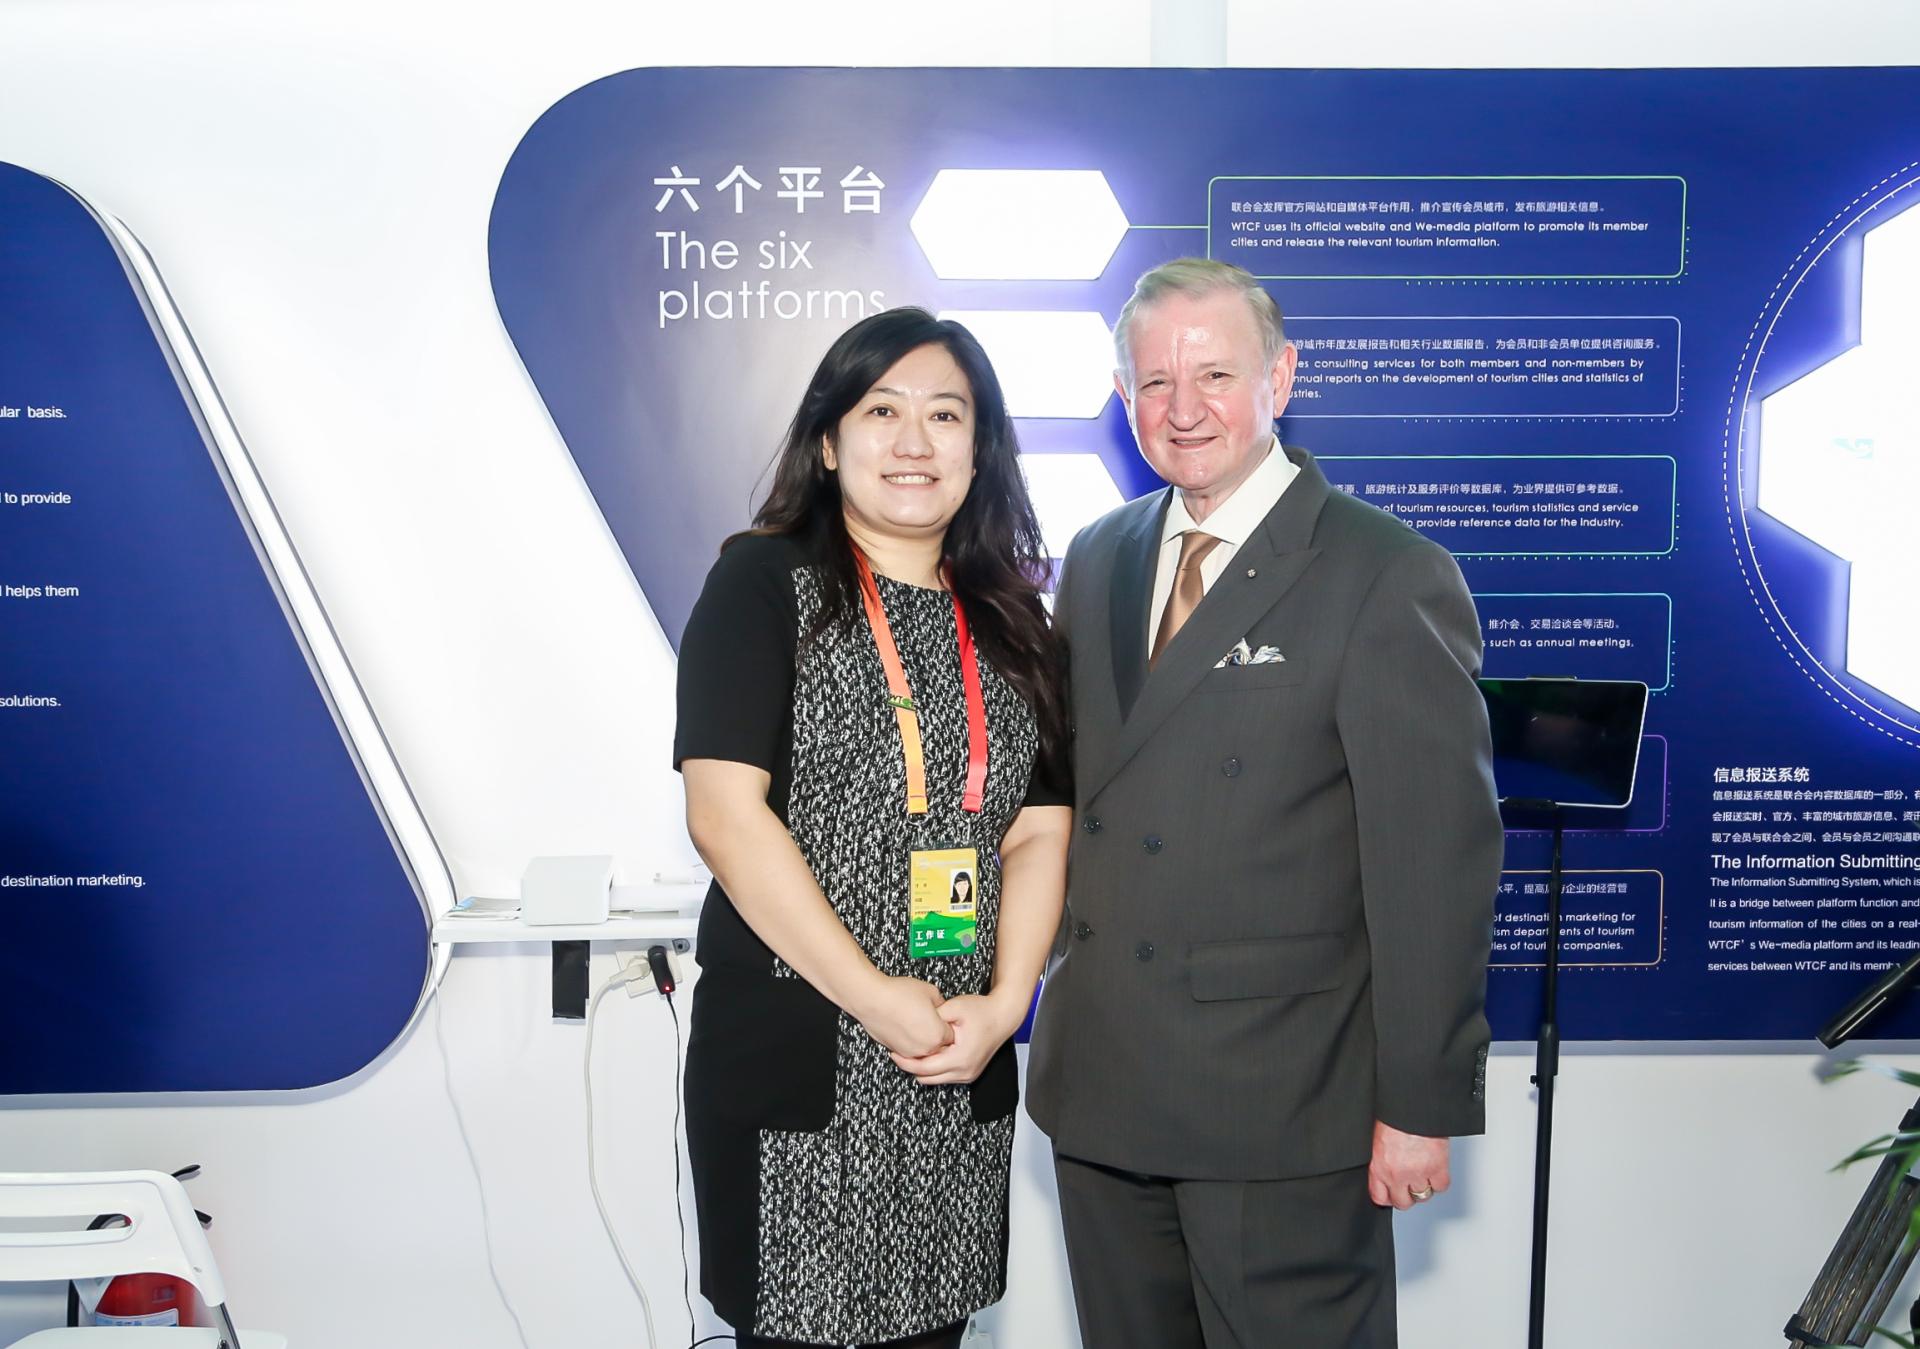 A photo of John Aquilina (right), Maltese Ambassador to China, taken at the booth of WTCF